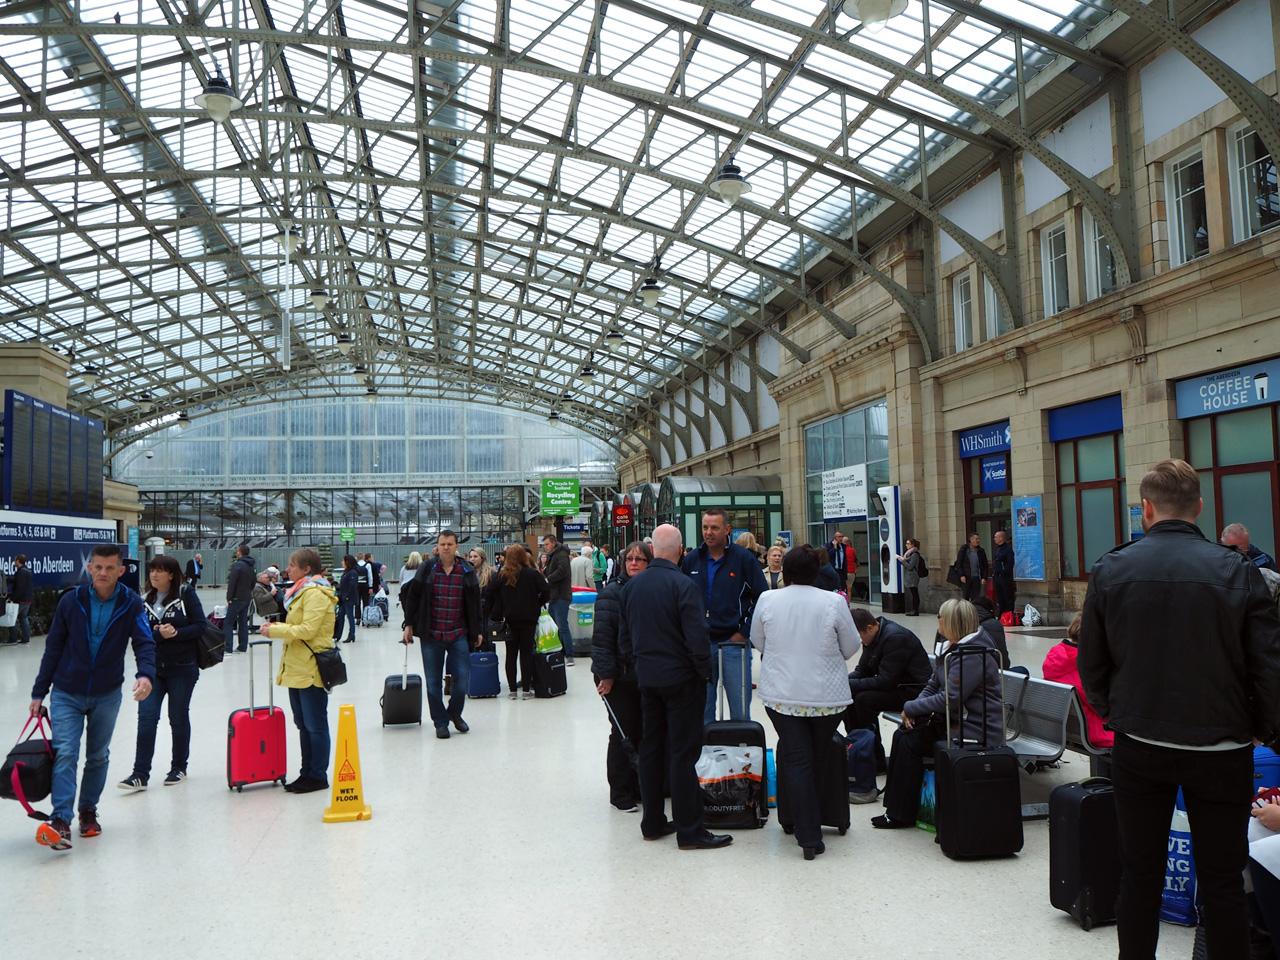 in de ontvangsthal van Aberdeen Station